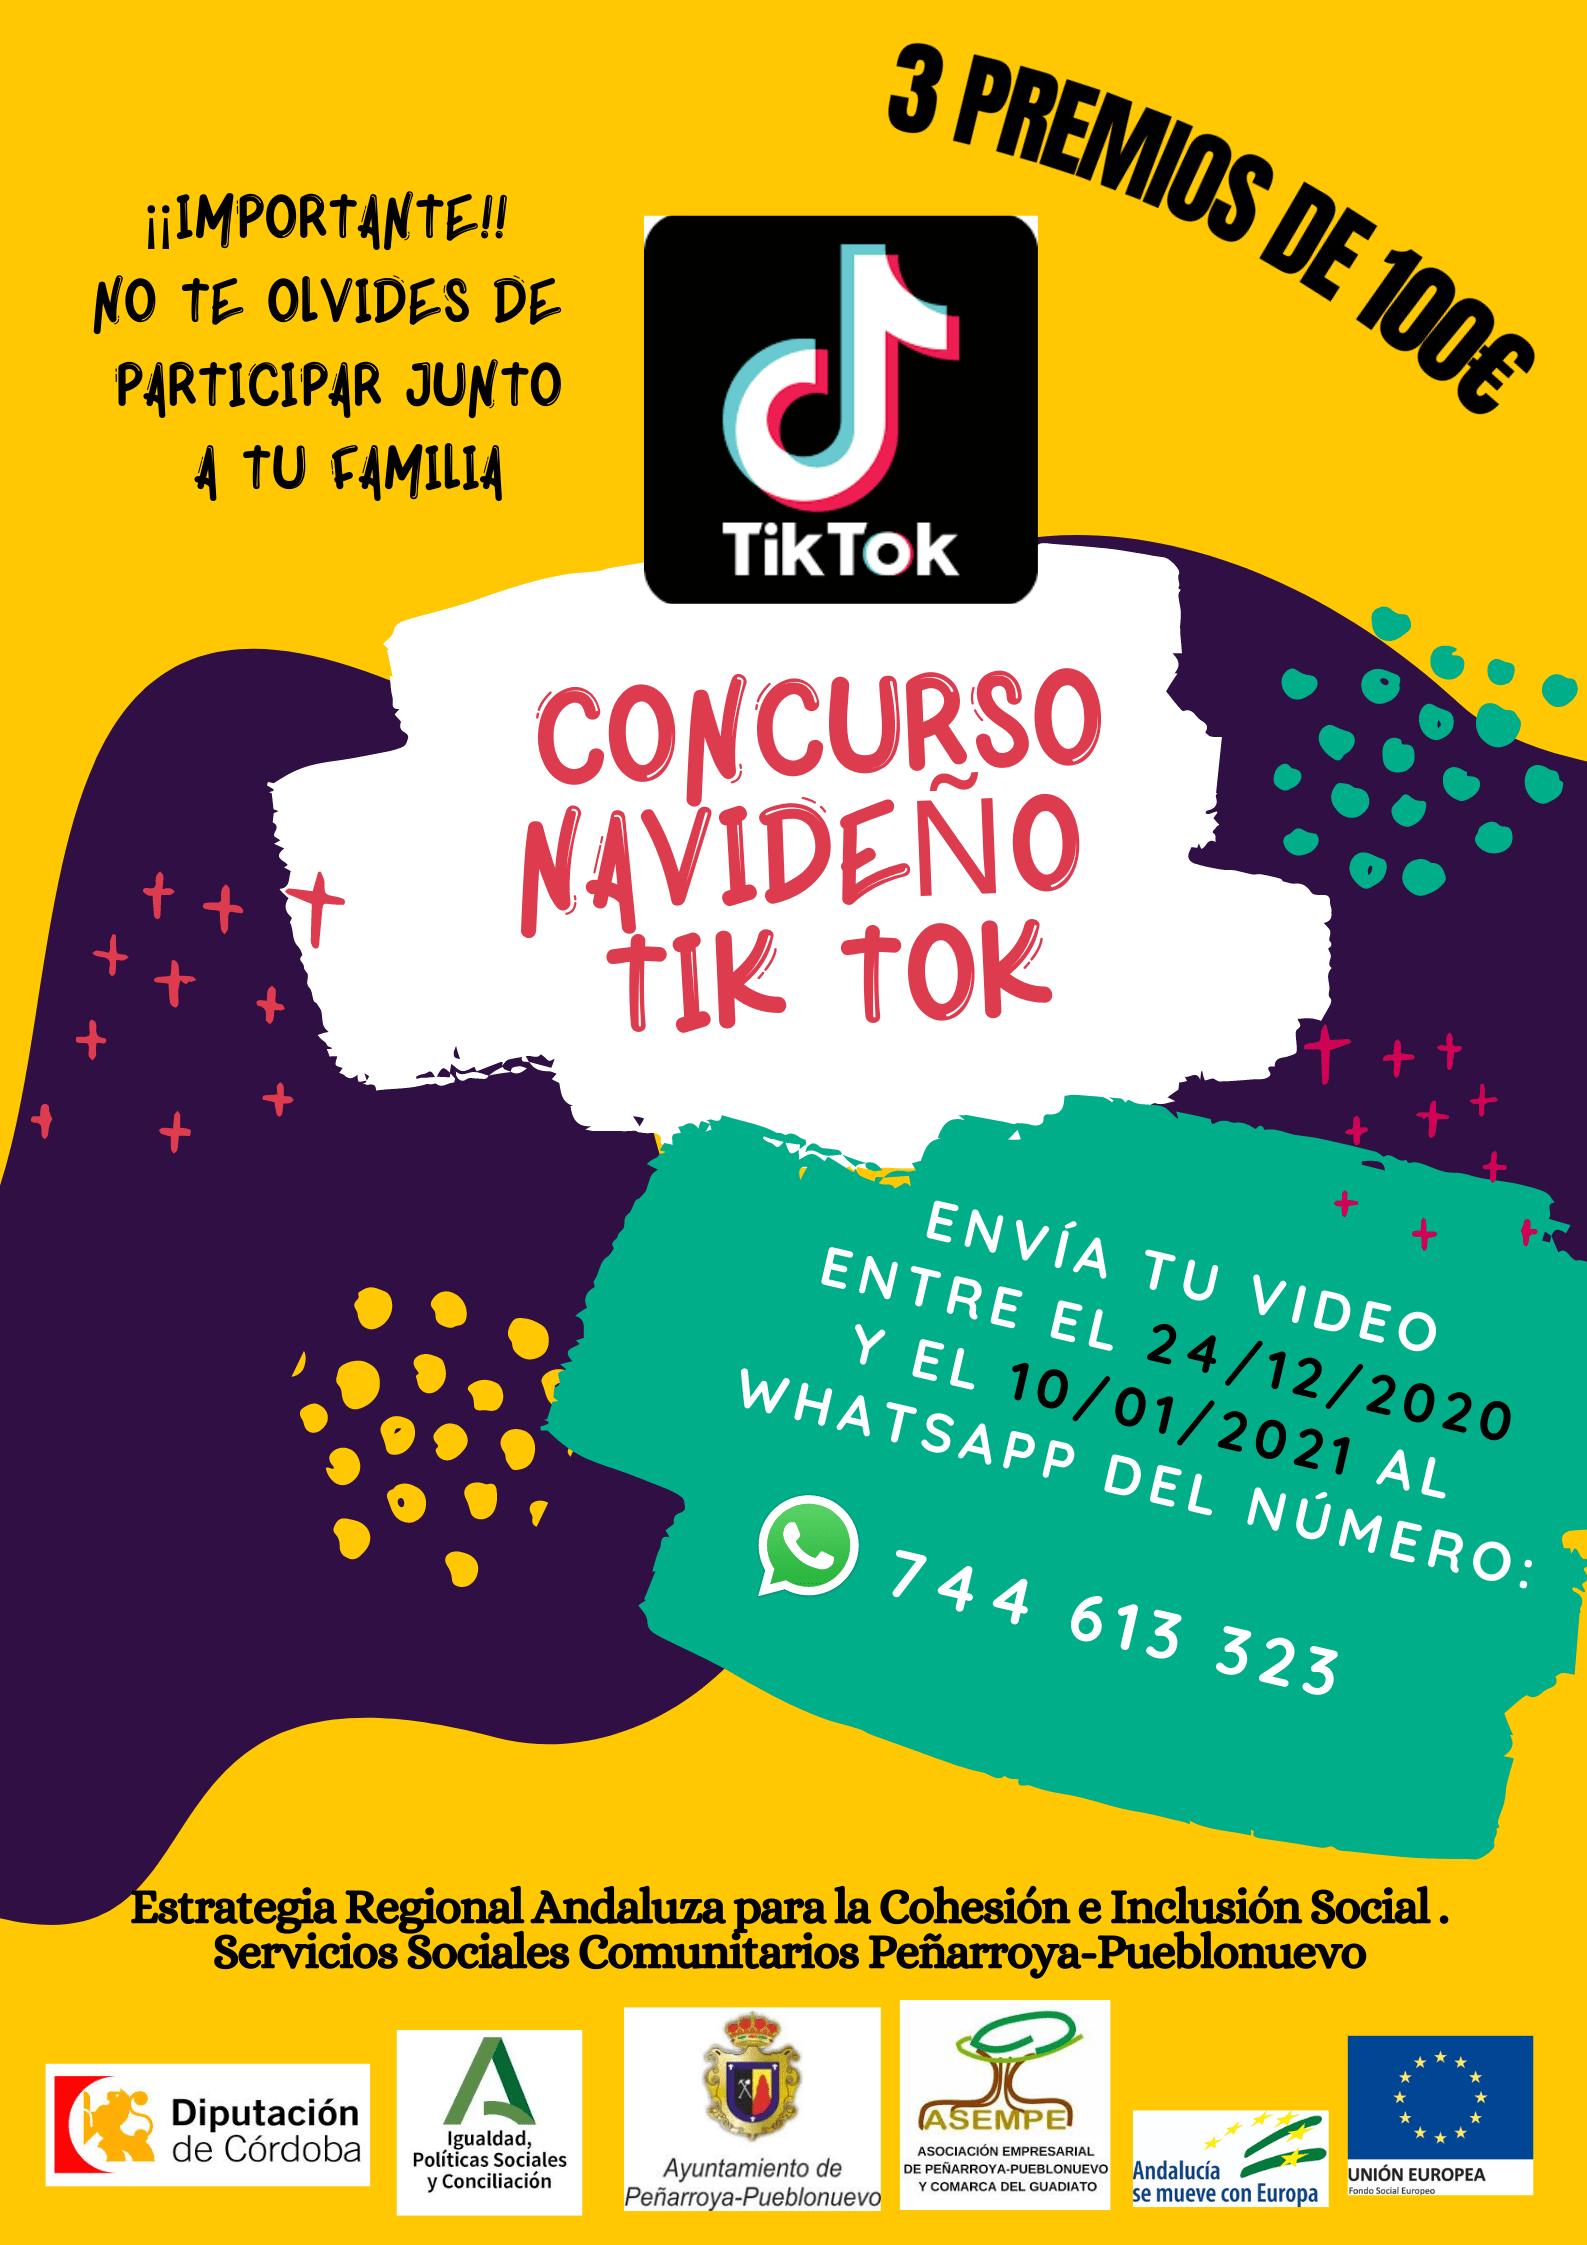 CONCURSO NAVIDEÑO TIK TOK 1